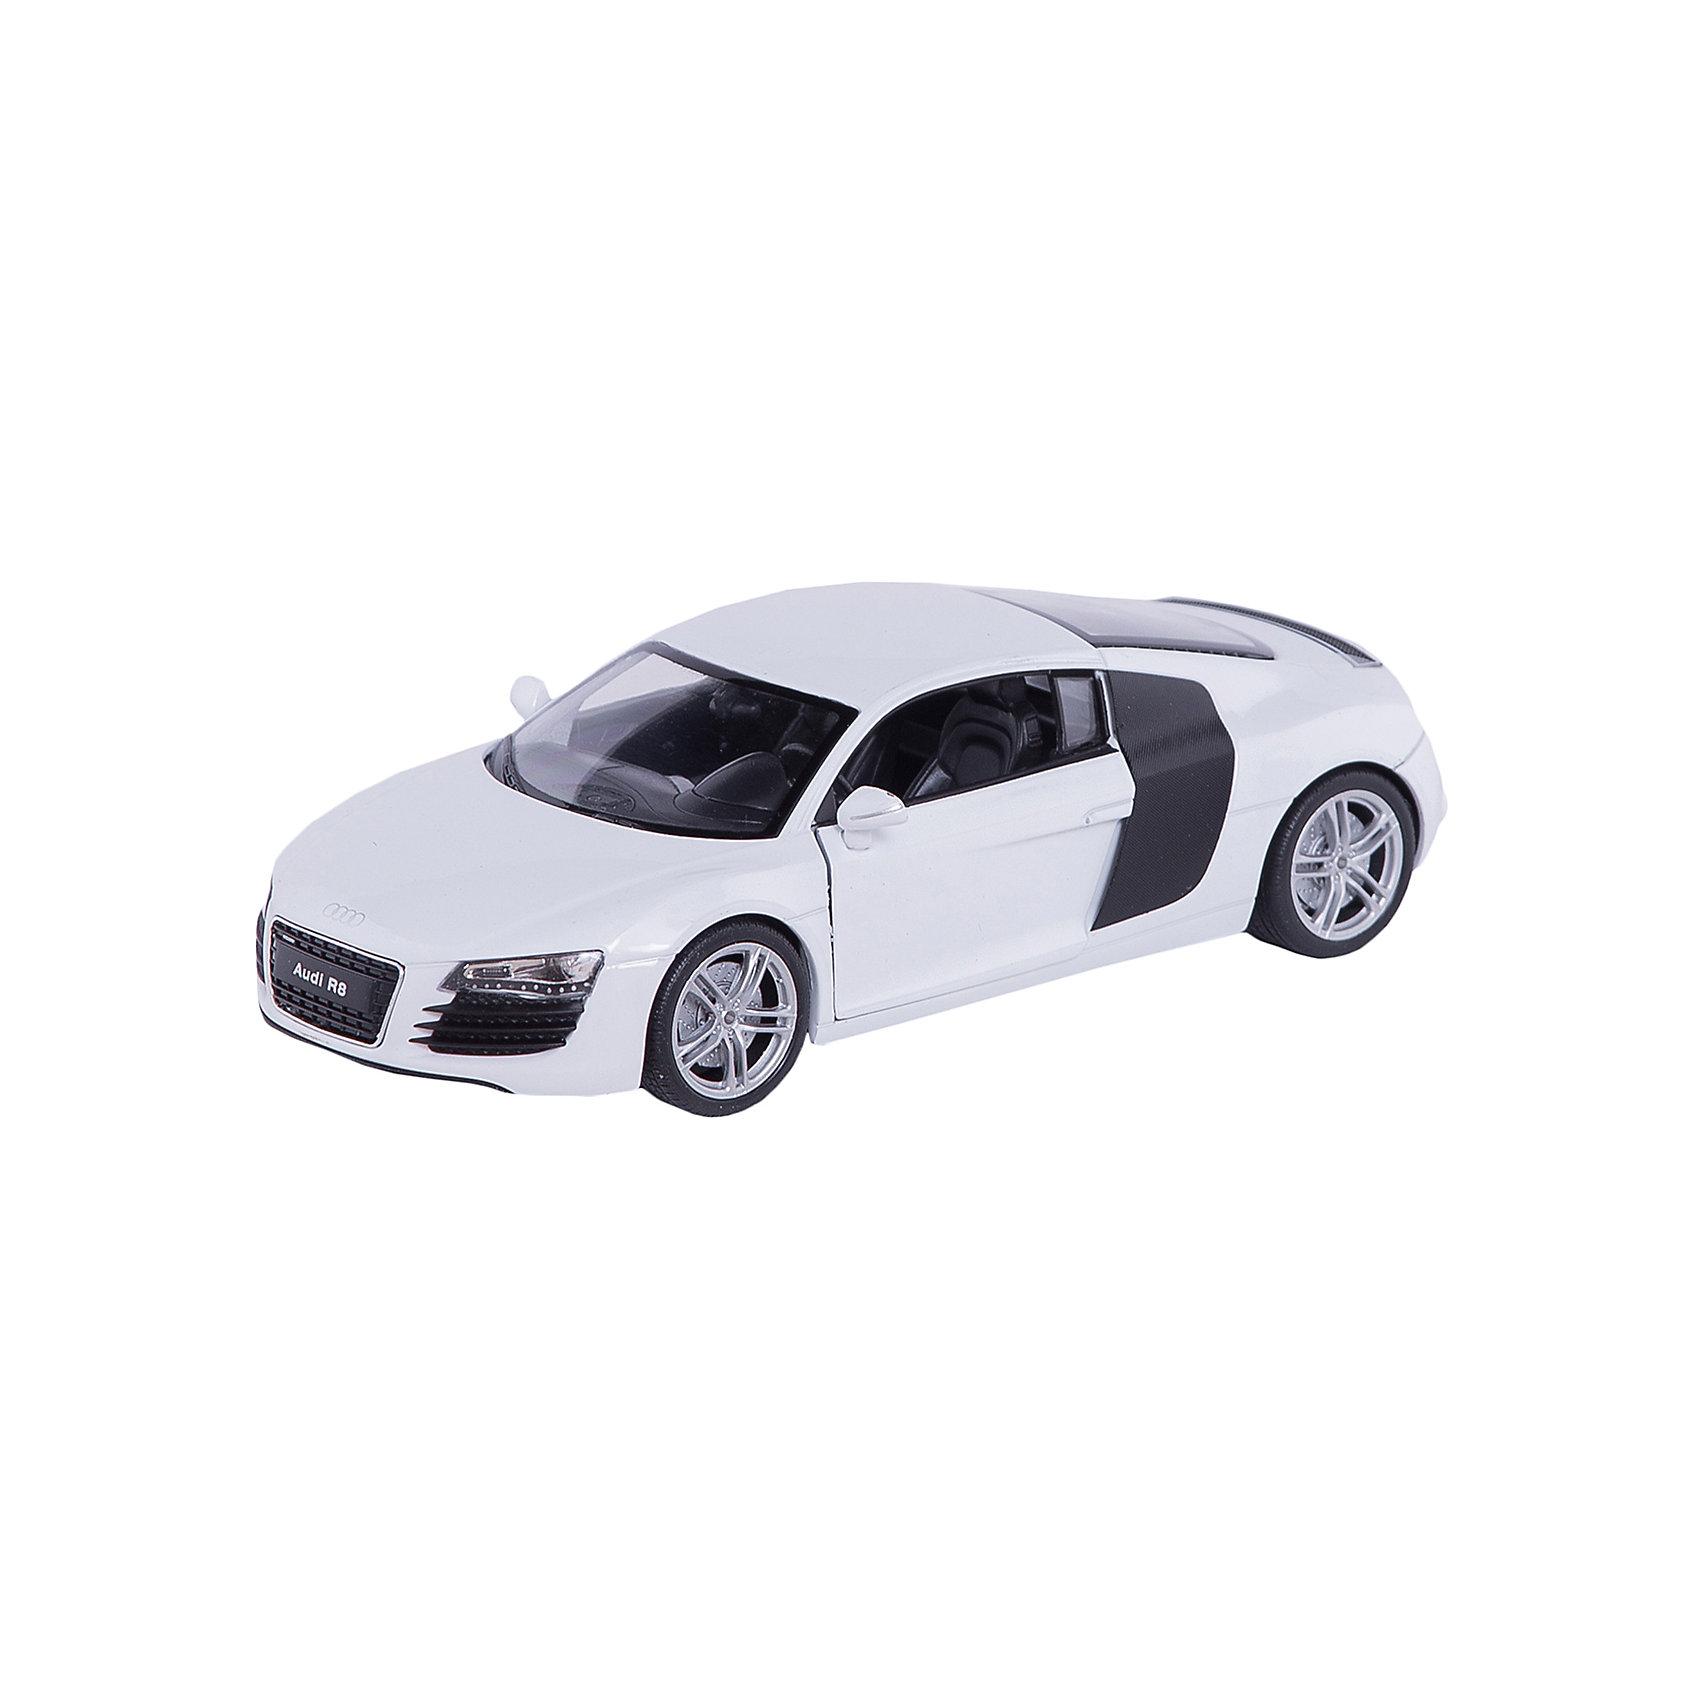 Модель машины 1:24 Audi R8, Welly